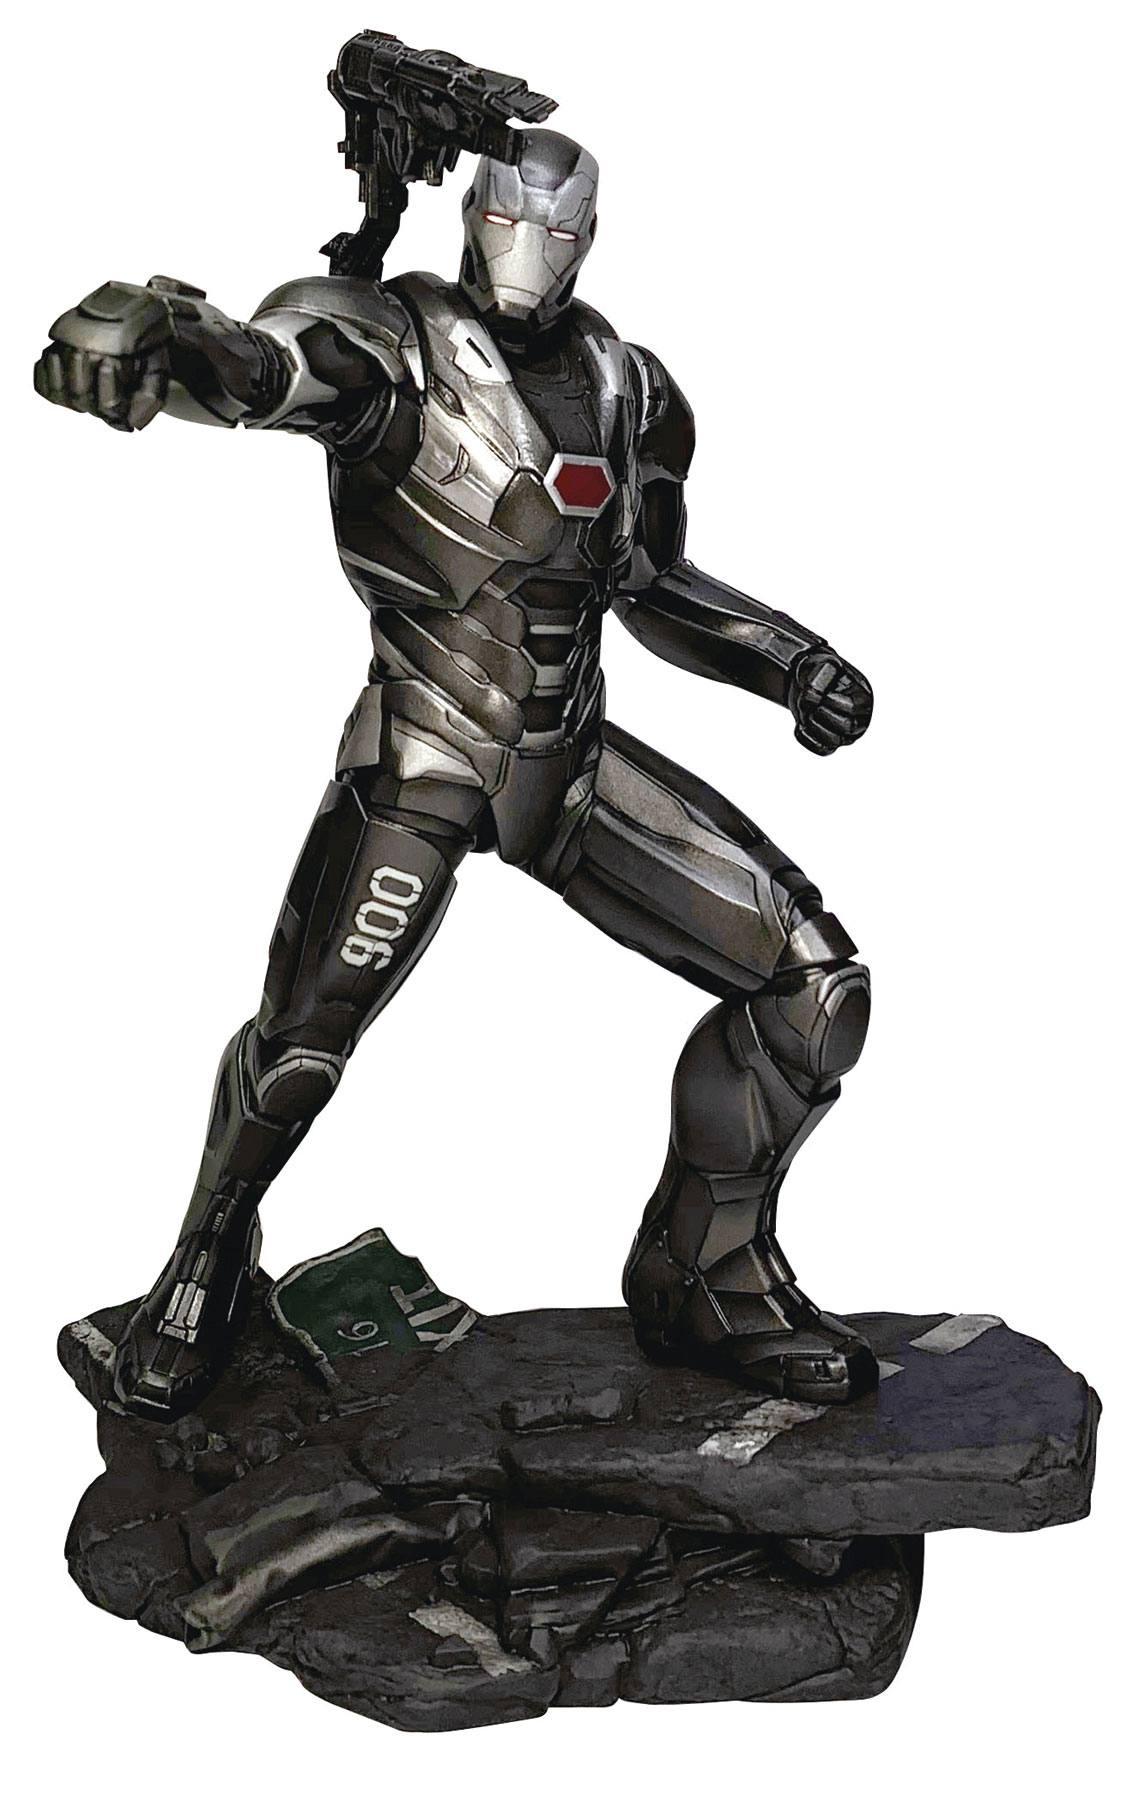 *PREORDER* Avengers Endgame  - Marvel Gallery: WAR MACHINE by Diamond Select